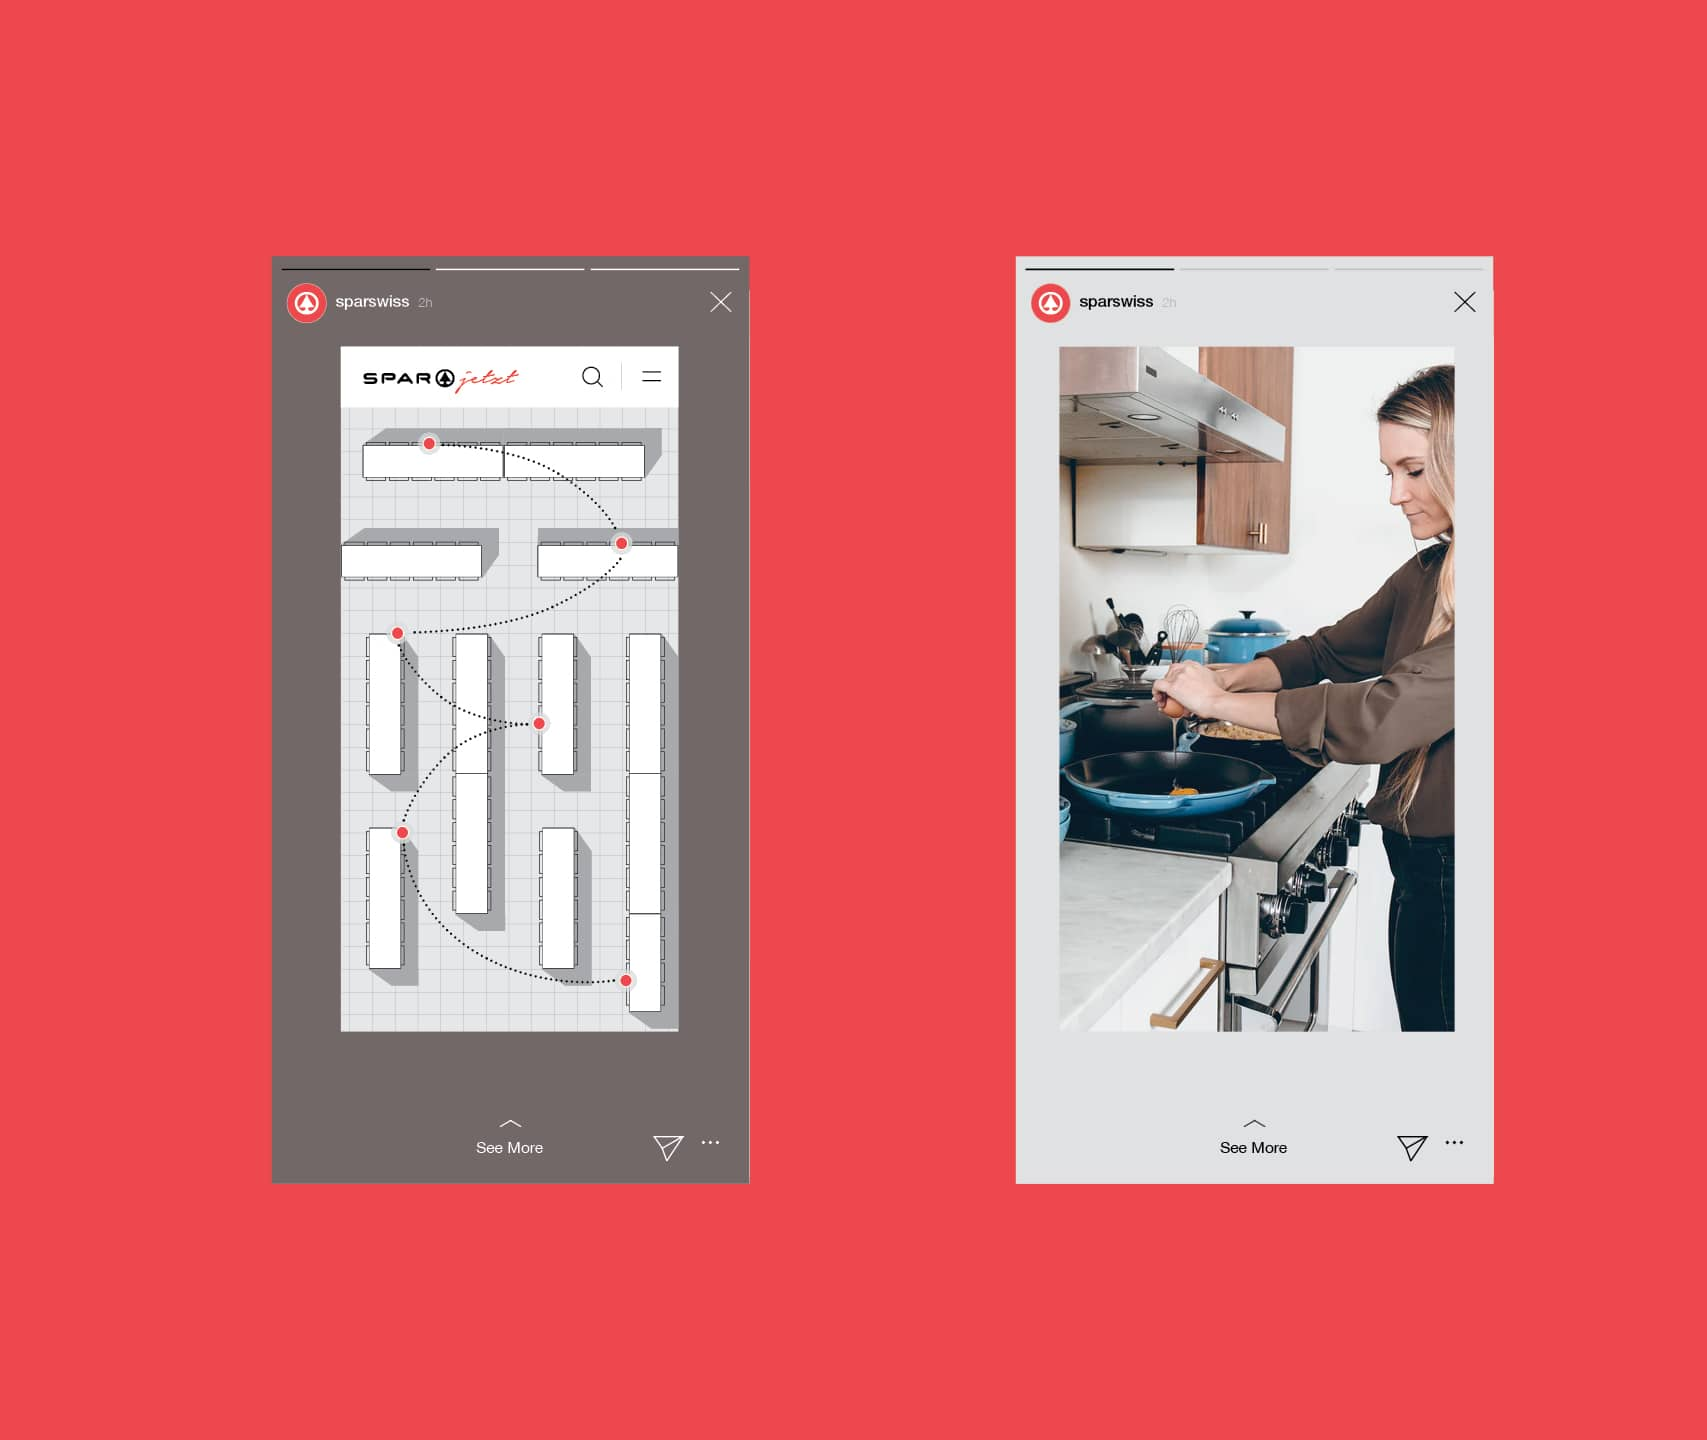 mantik-digital-branding-development-agency-chocolate-packaging-webdesign-design-app-ui-shopping-grocery-store22-min